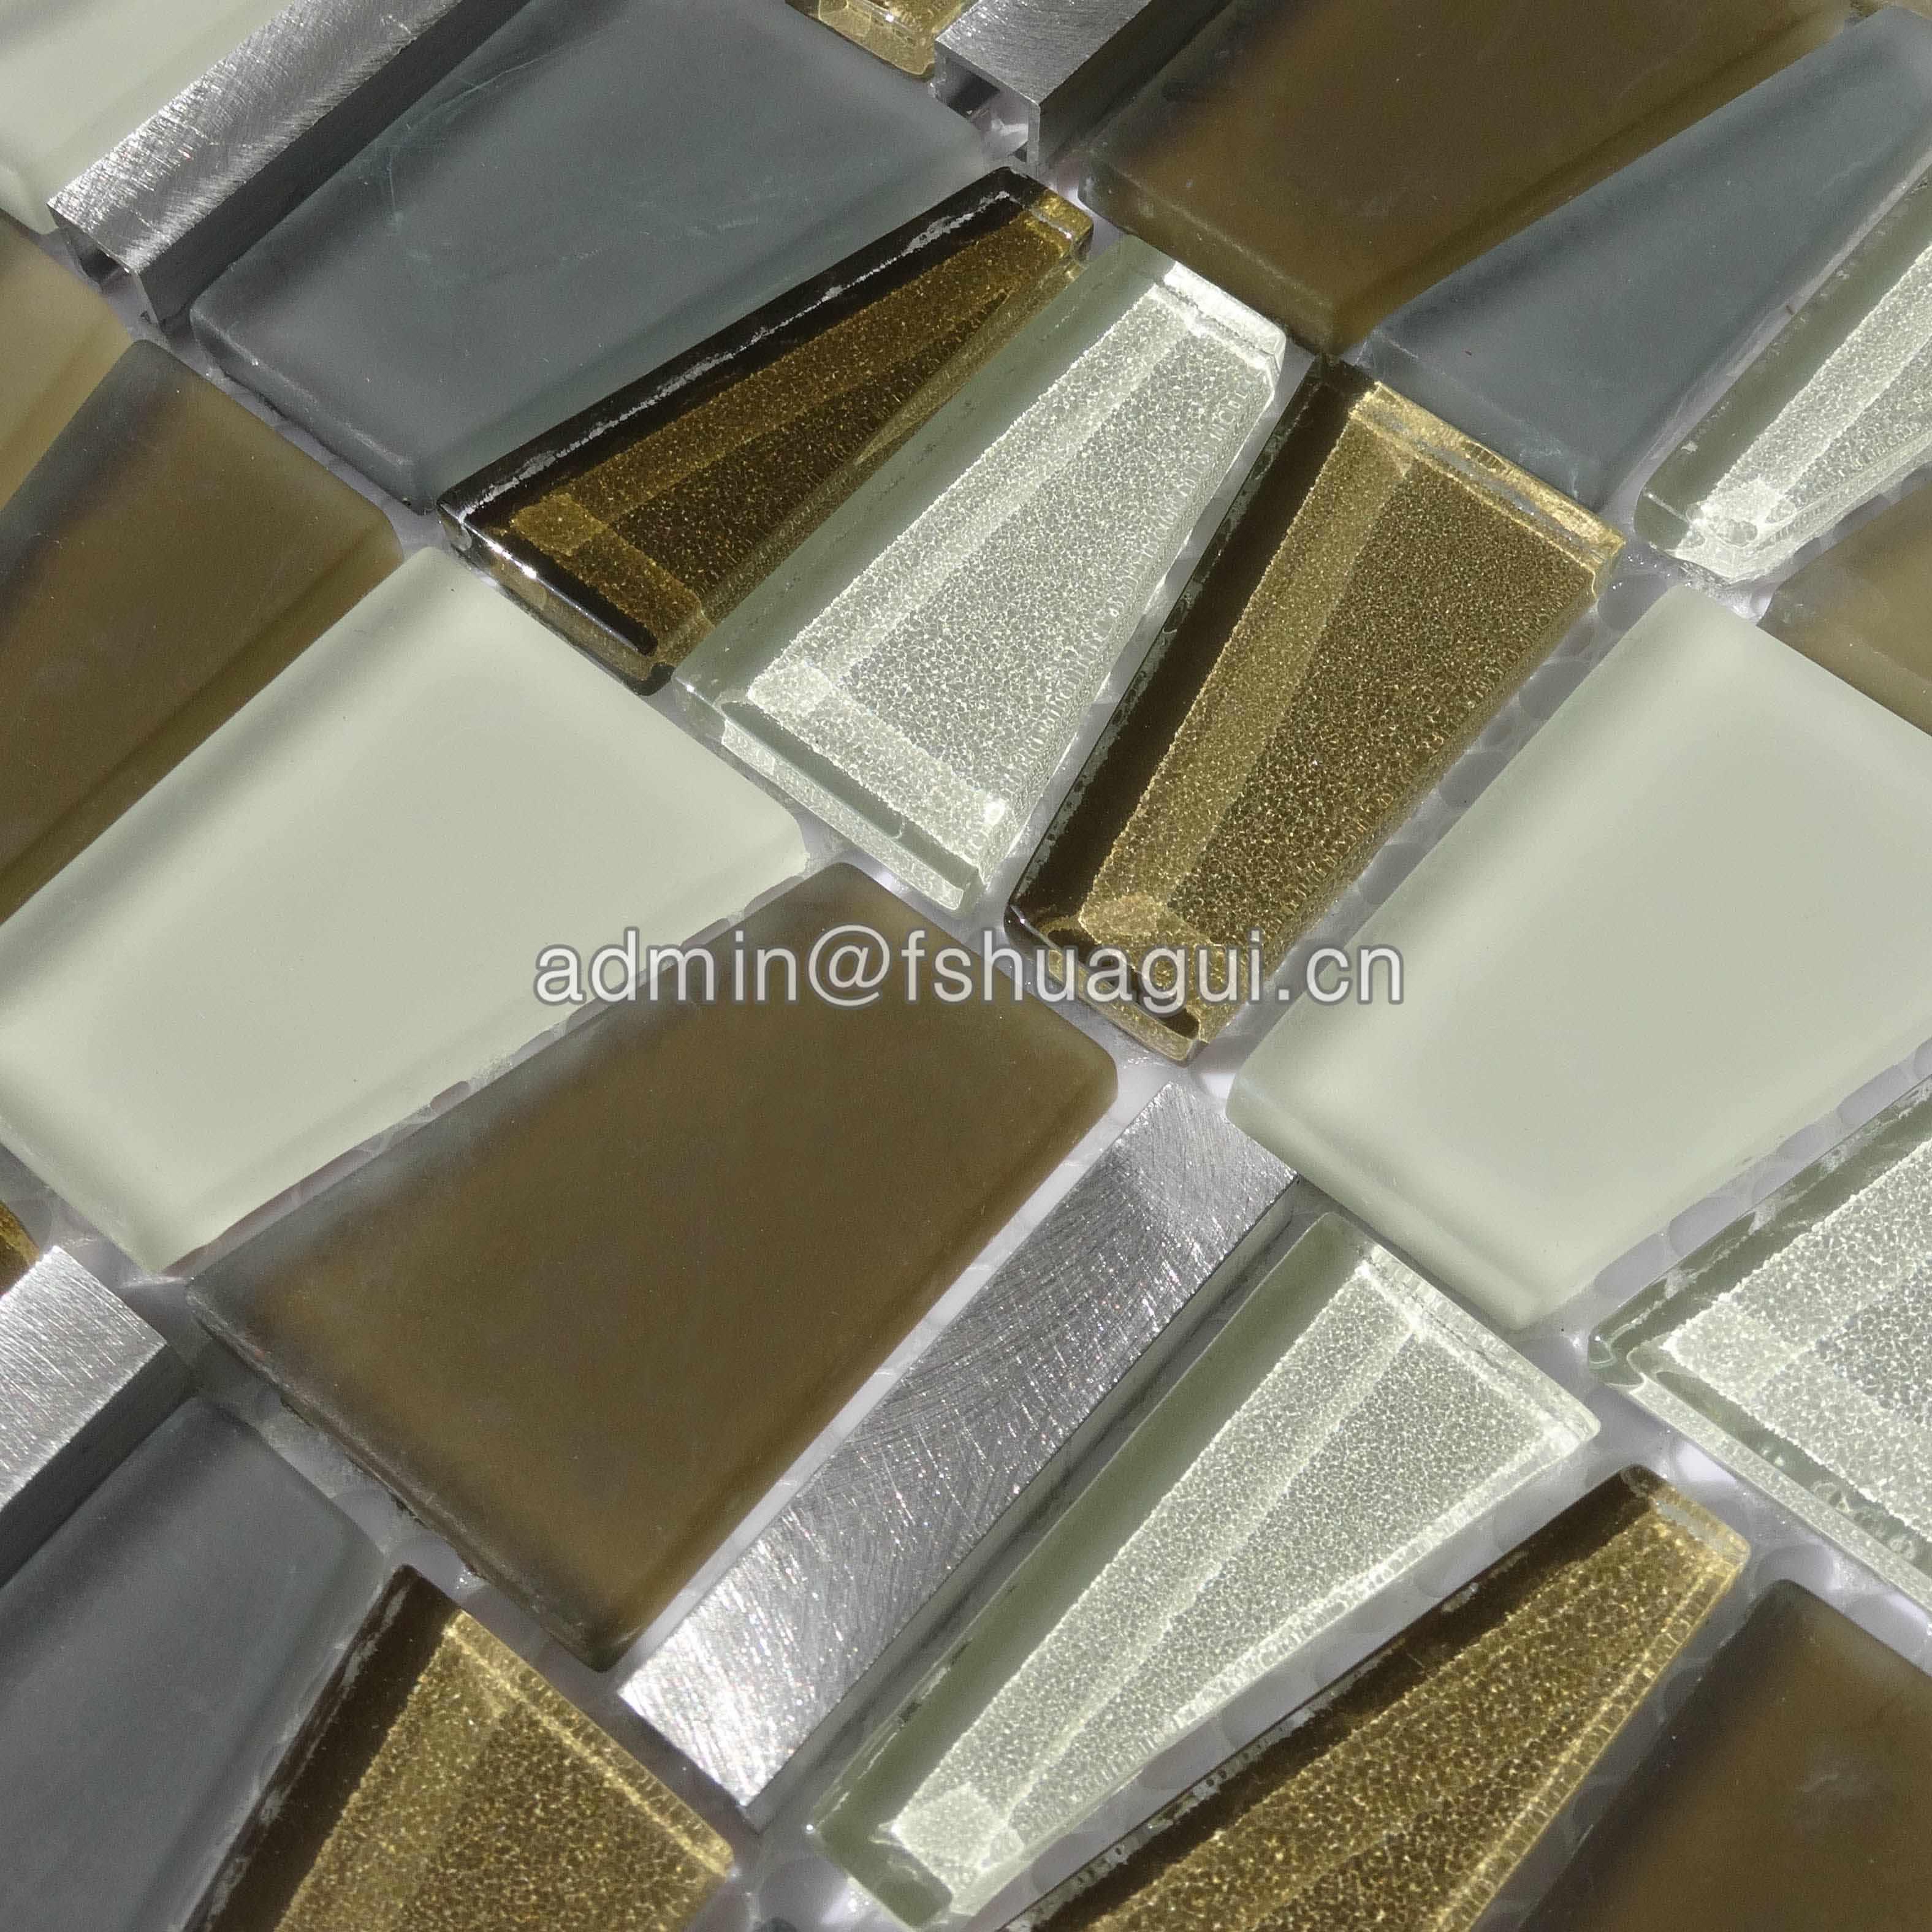 Huagui Glass Metal Mosaic Wall Tile HG-YA002 METAL MOSAIC TILE image5